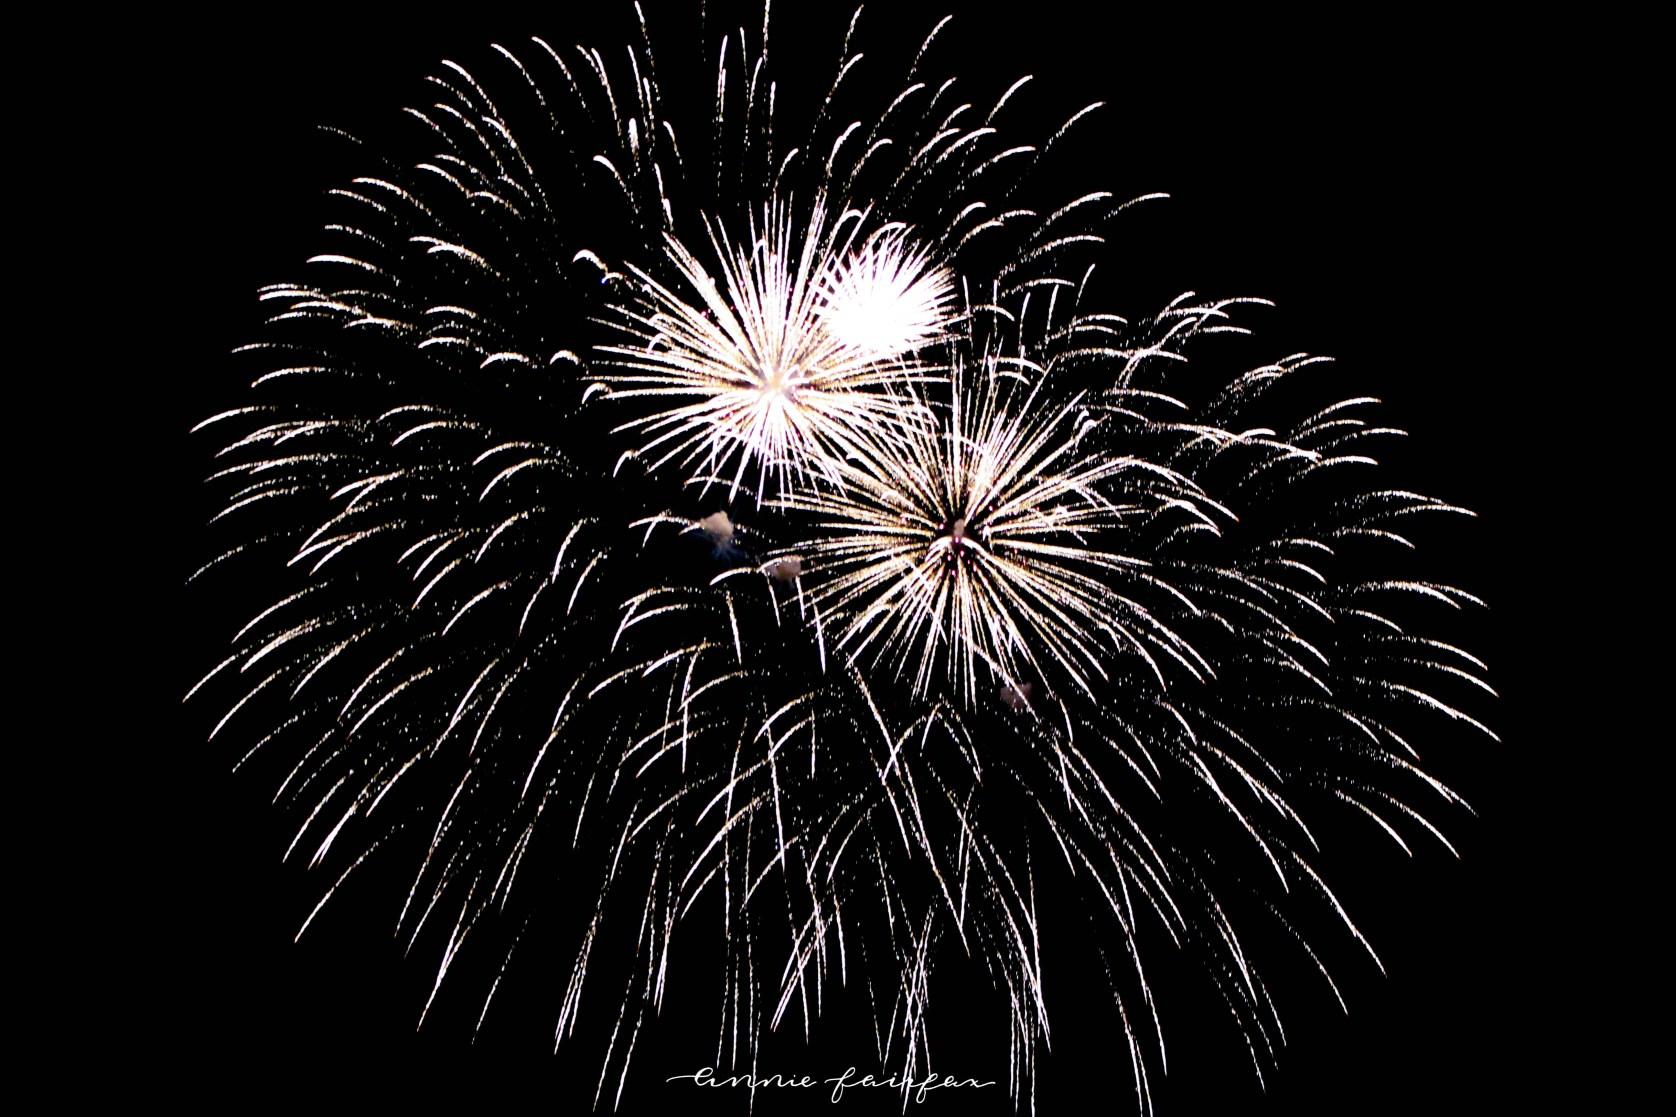 Grand Hotel Mackinac Island fireworks 4th of July